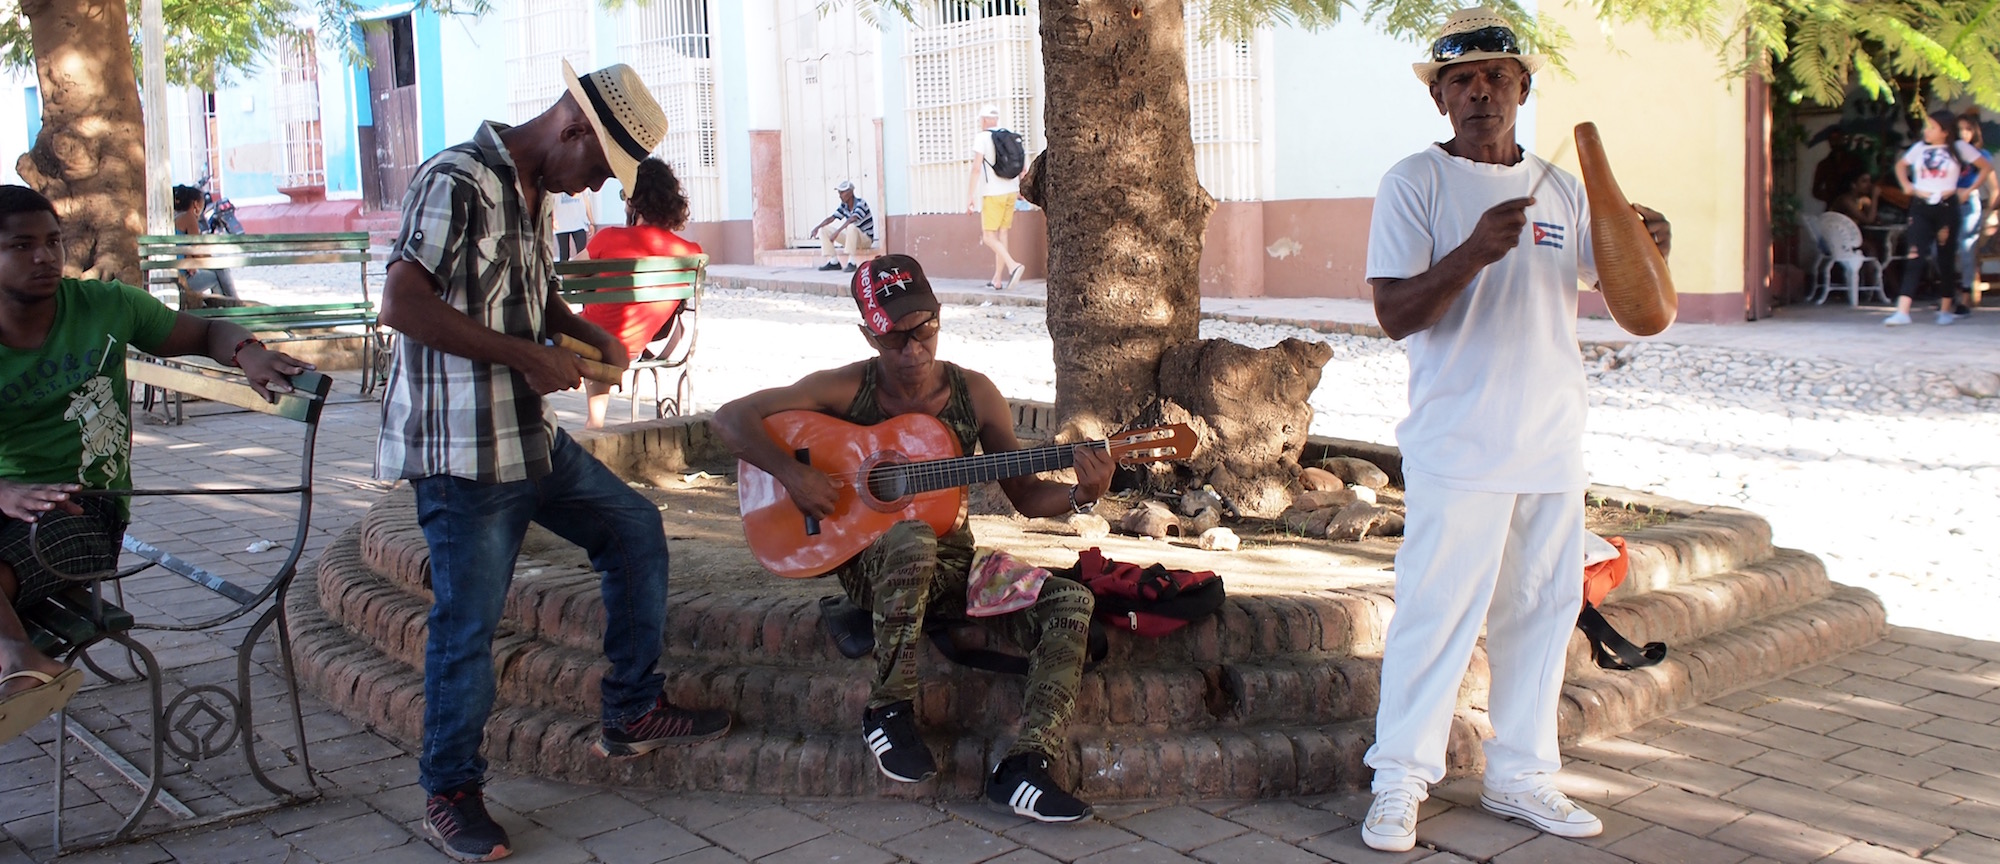 trinidadmusician